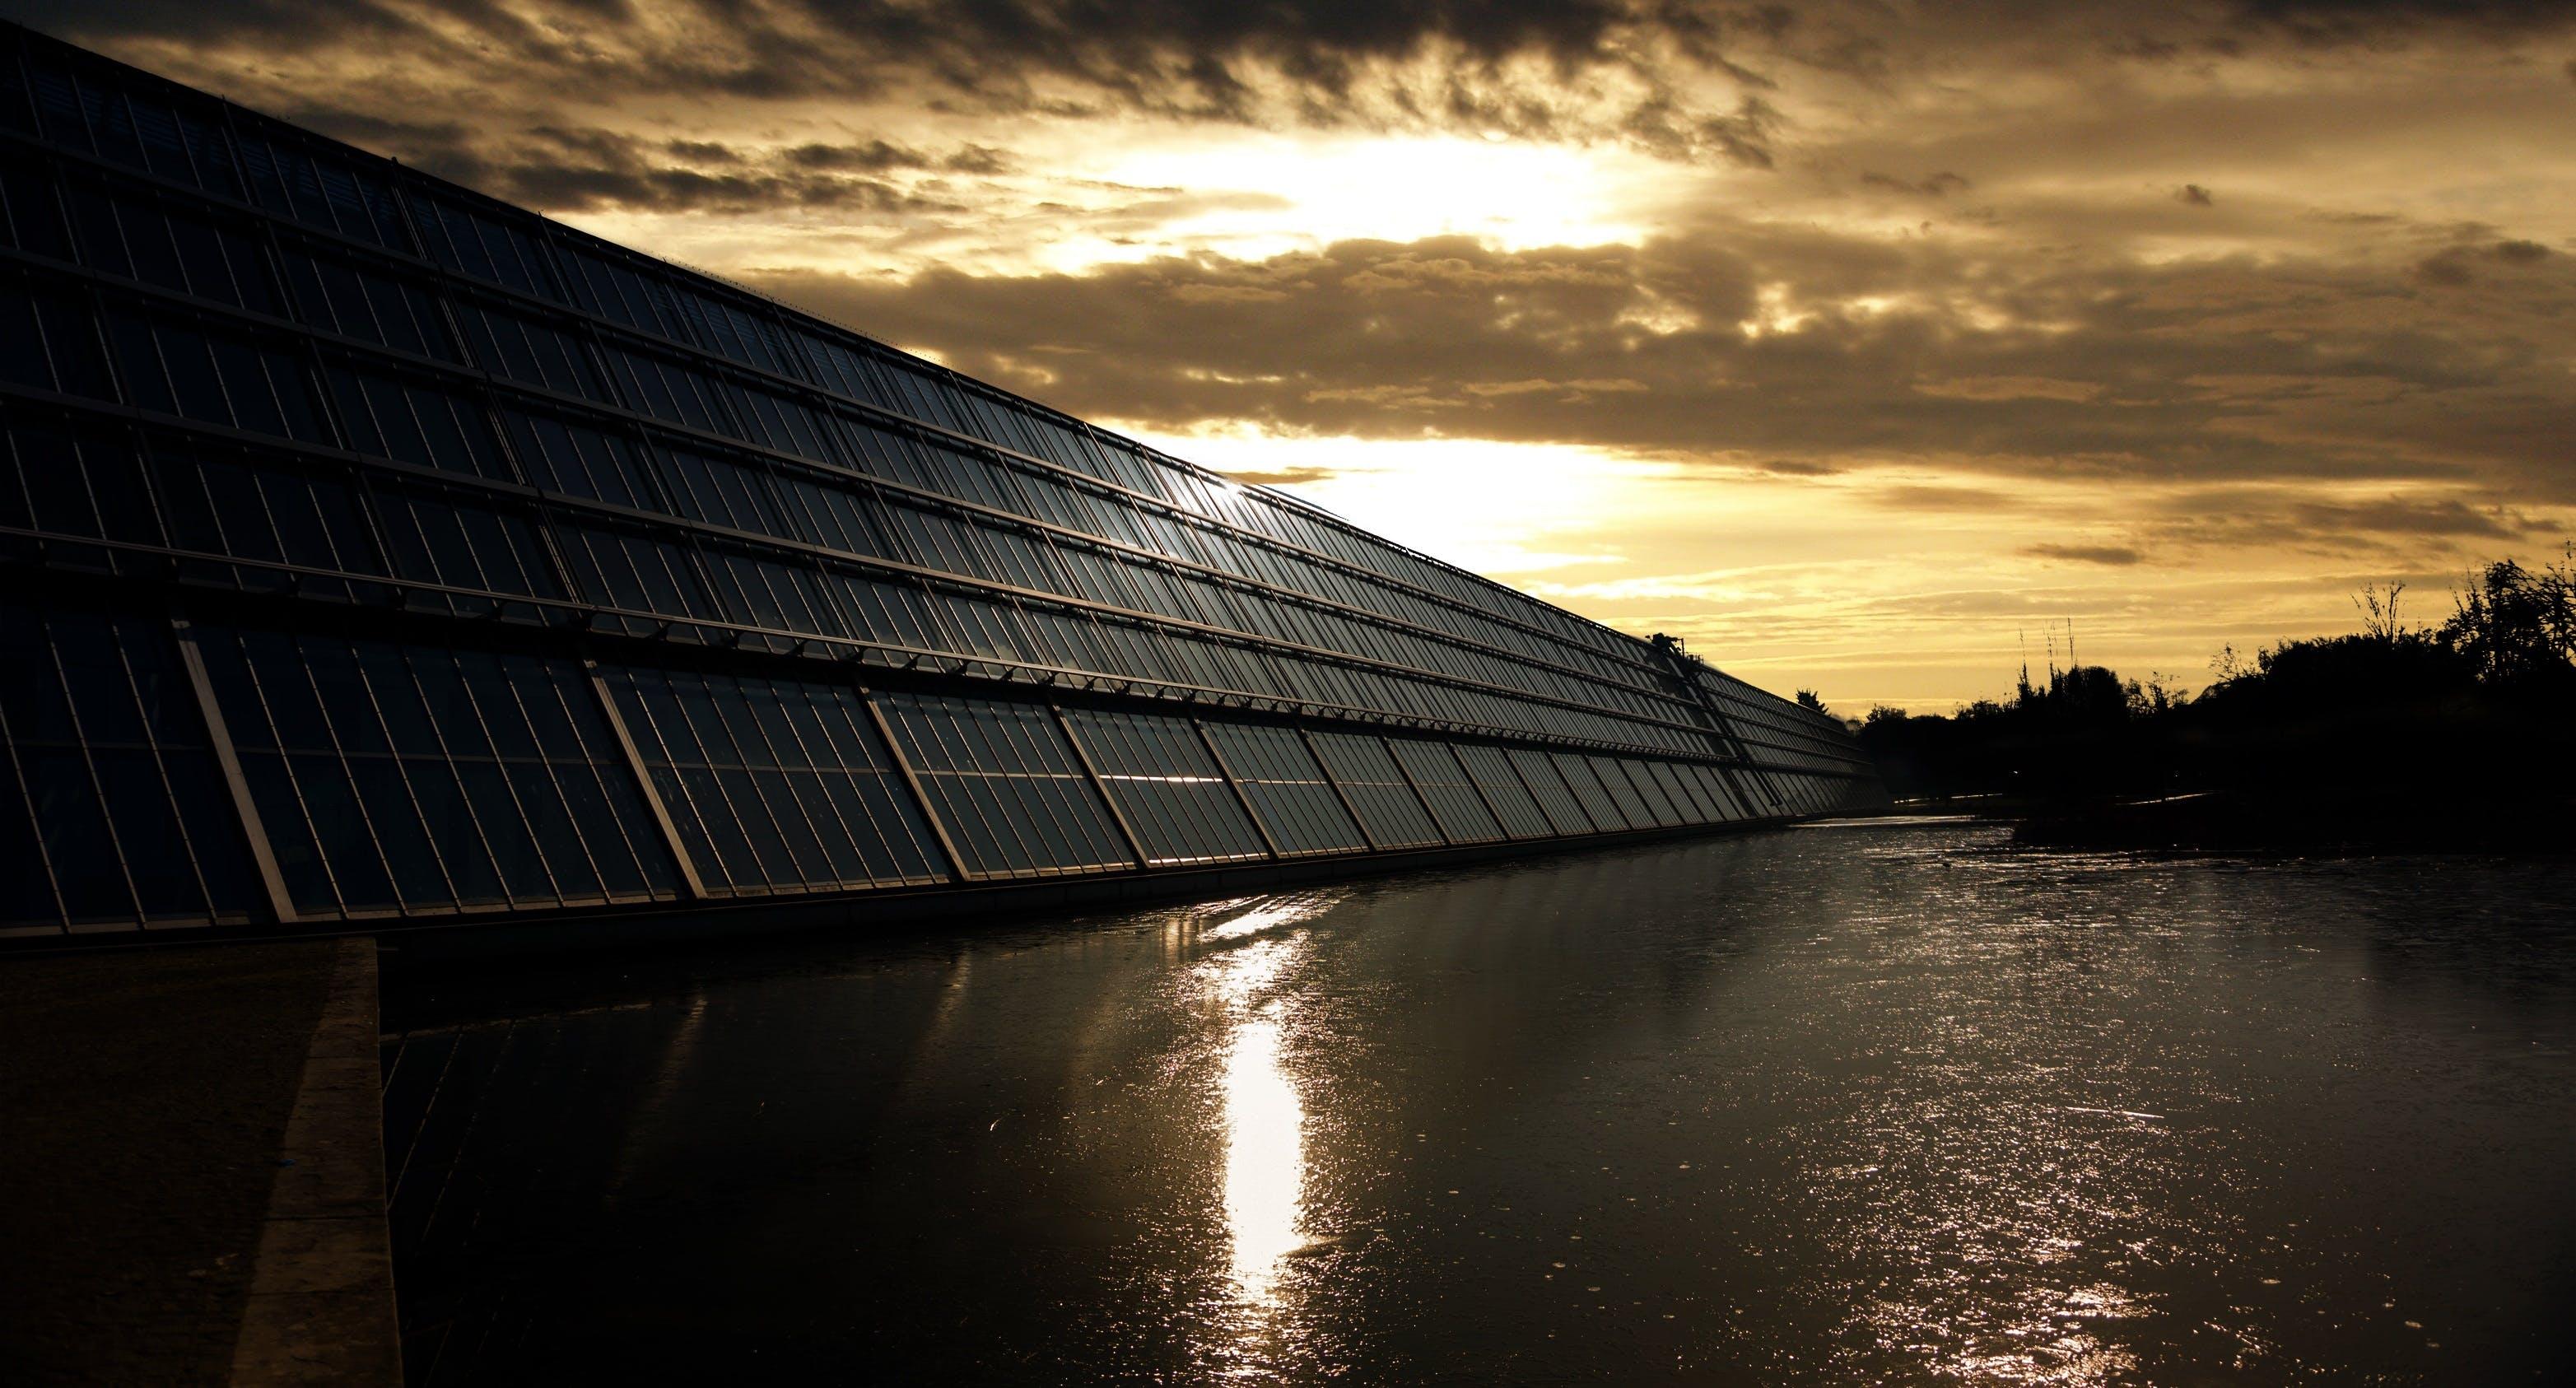 Black Solar Panel Near Calm Body of Water